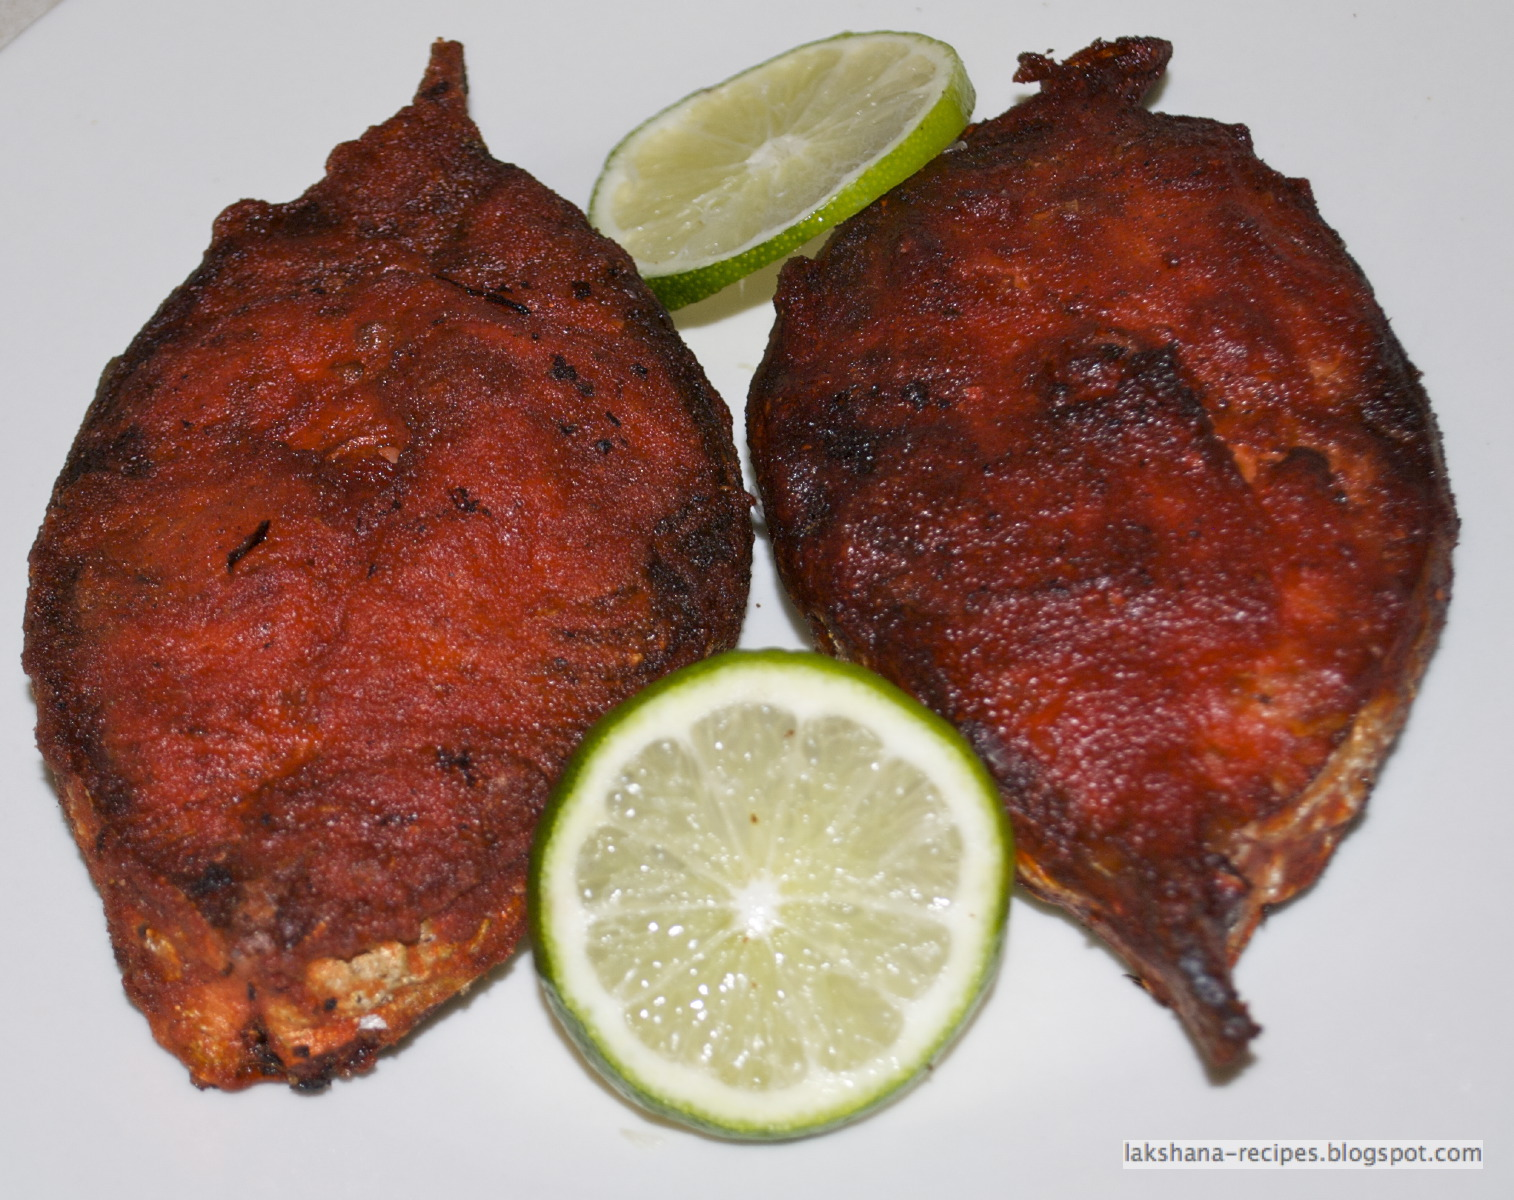 Lakshana recipes fish fry ii for Fish fry images